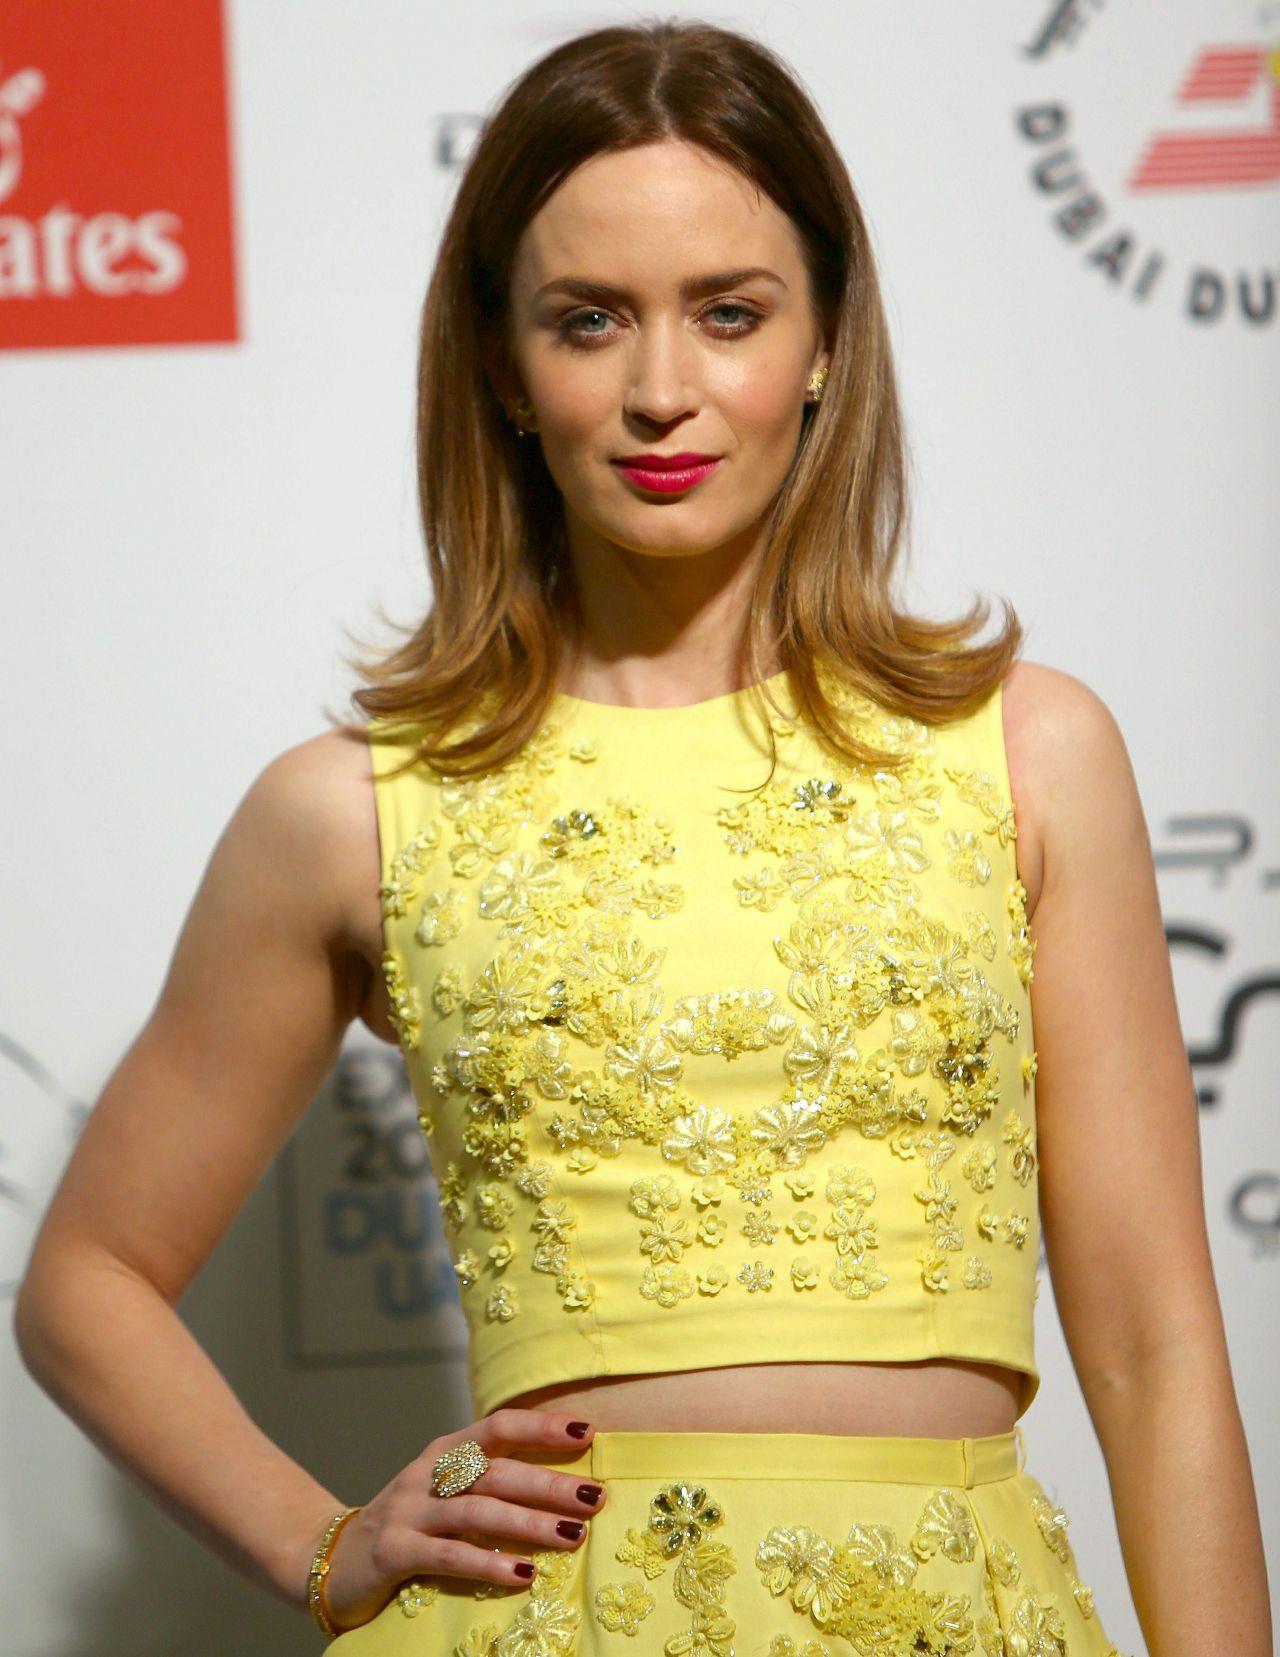 Emily Blunt - 2014 Dubai International Film Festival - Opening Night